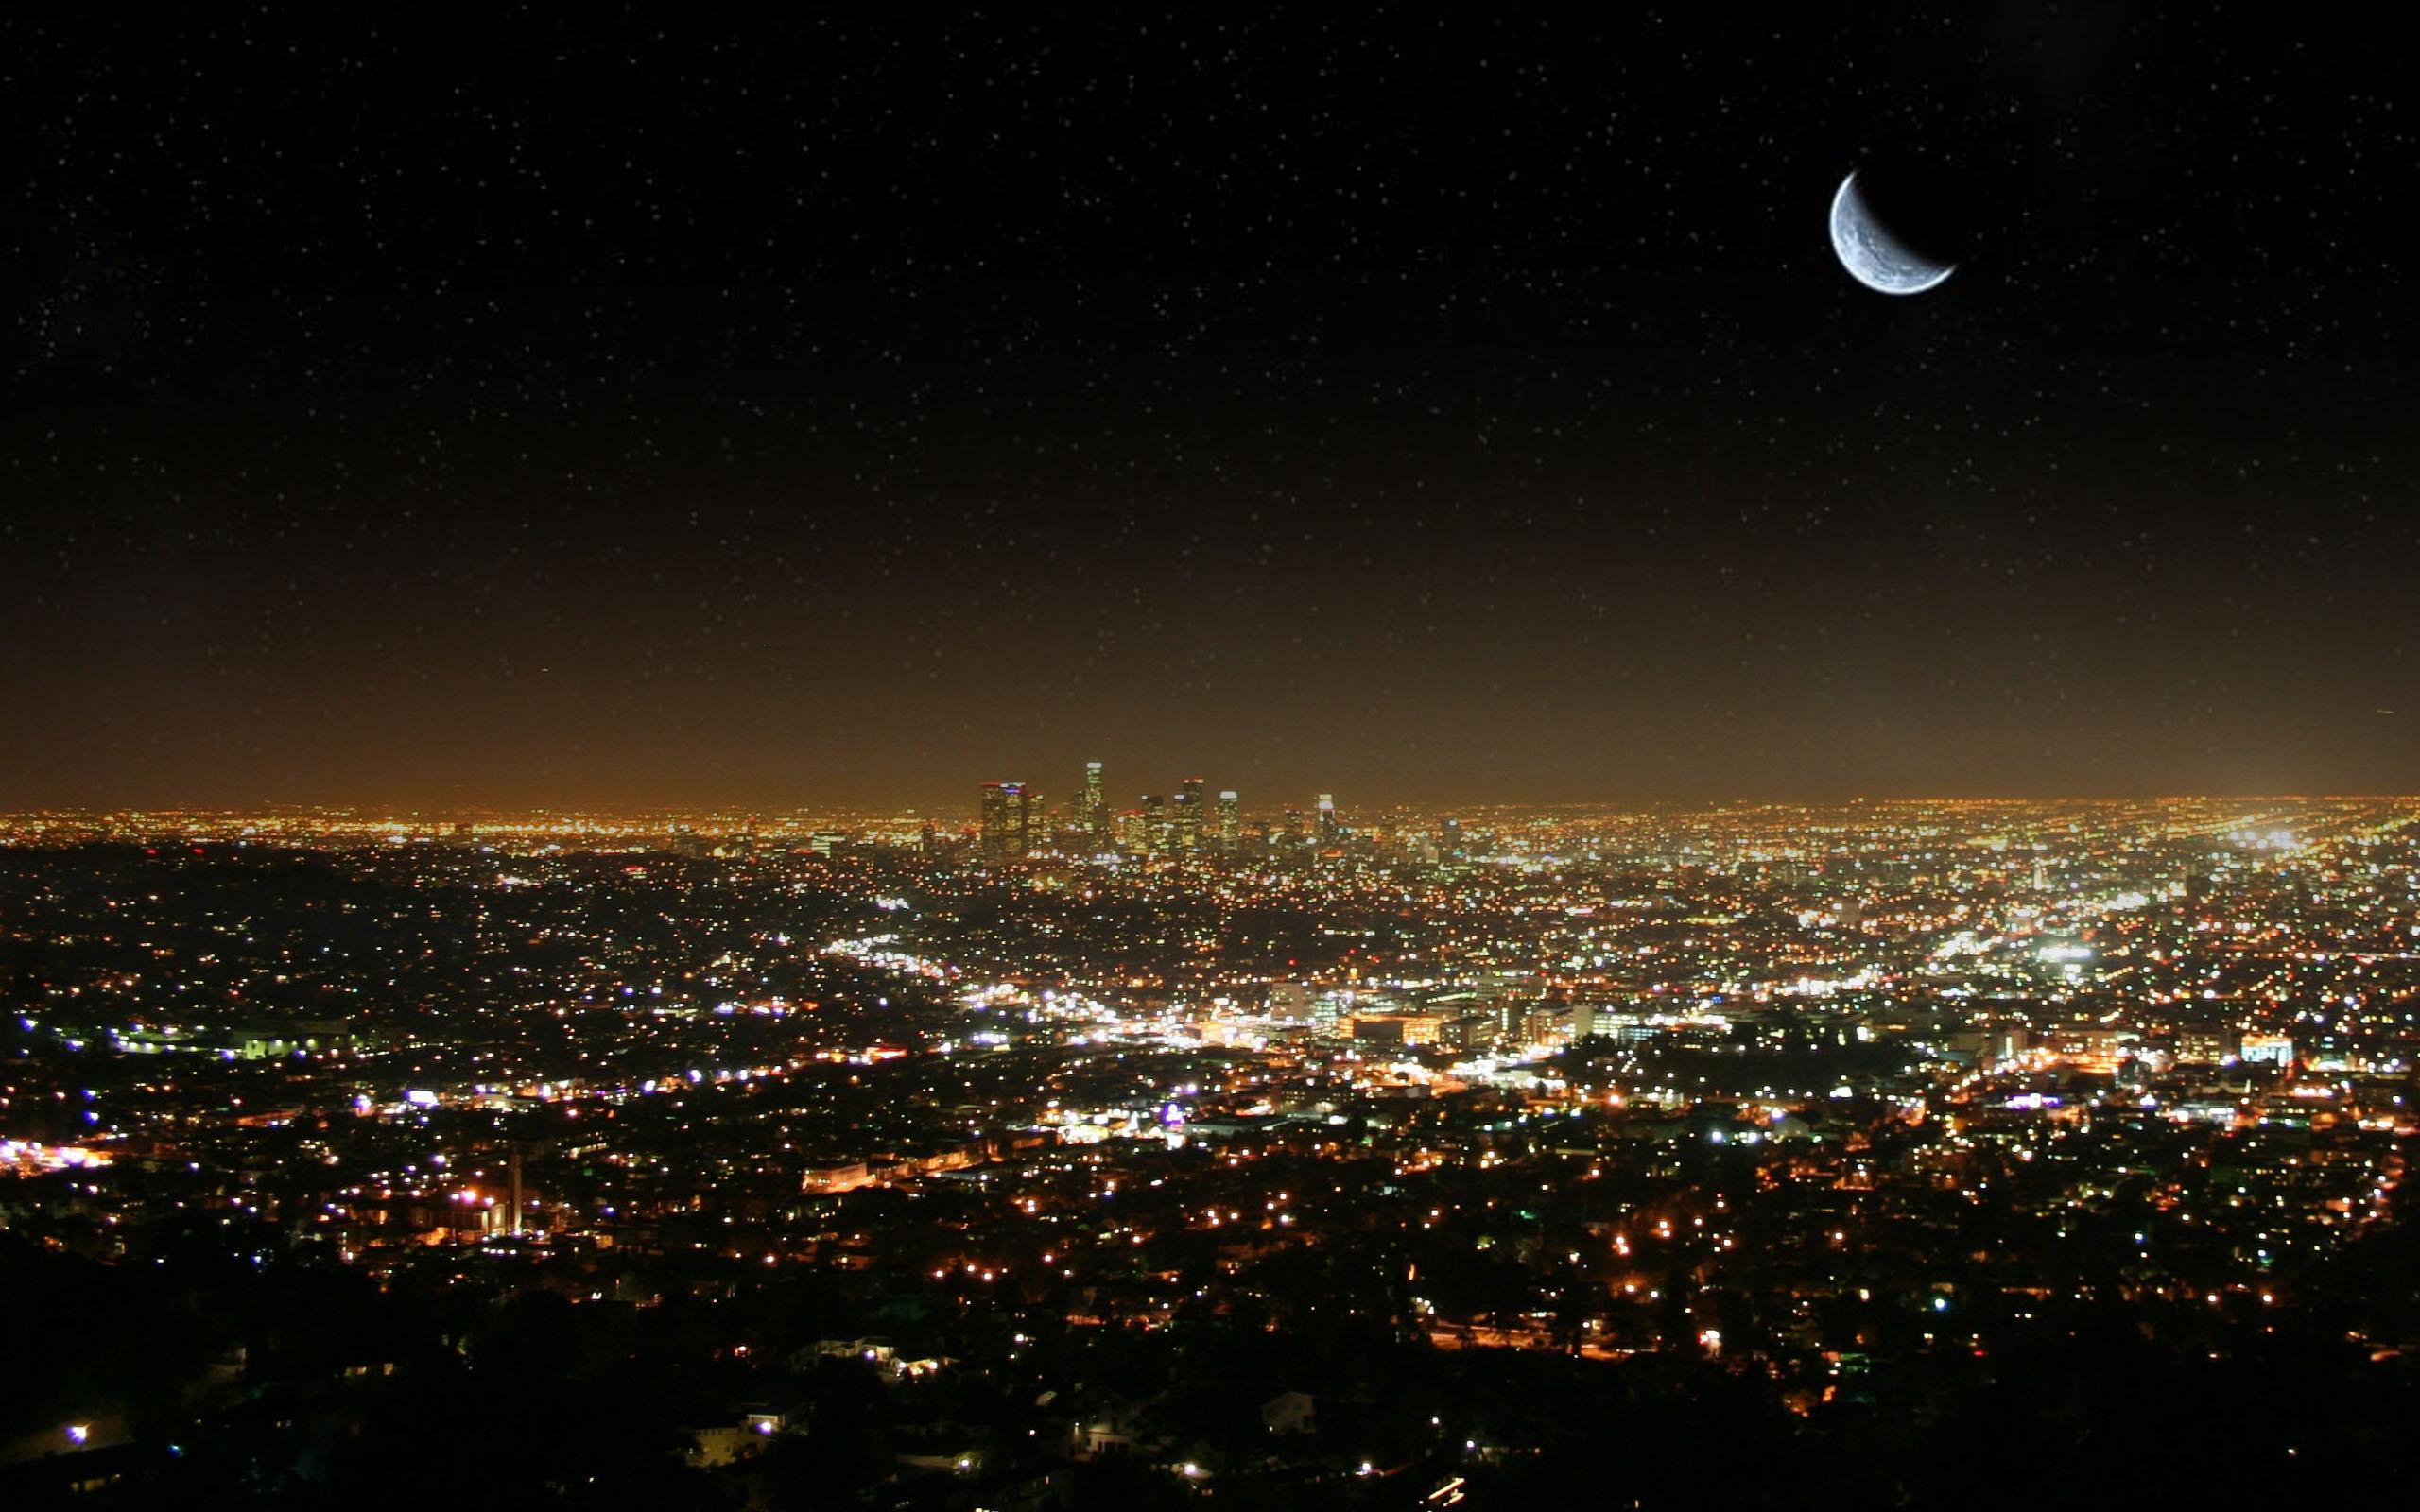 los_angeles_desktop_wallpaper_wallpapers_hd_background_city_at_night_la-2560x1600